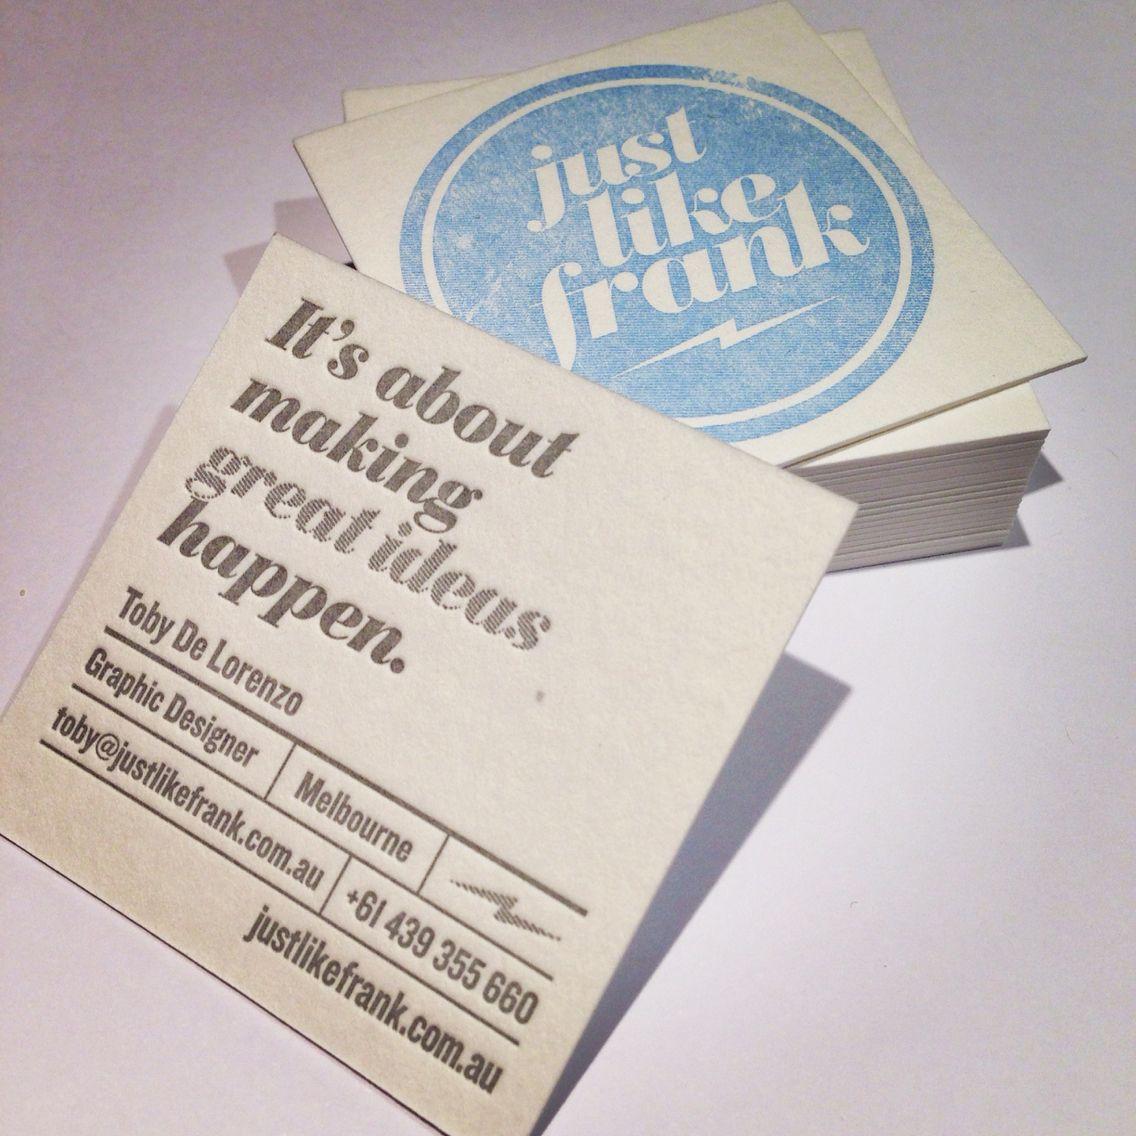 Just like frank letterpress business cards httpwww